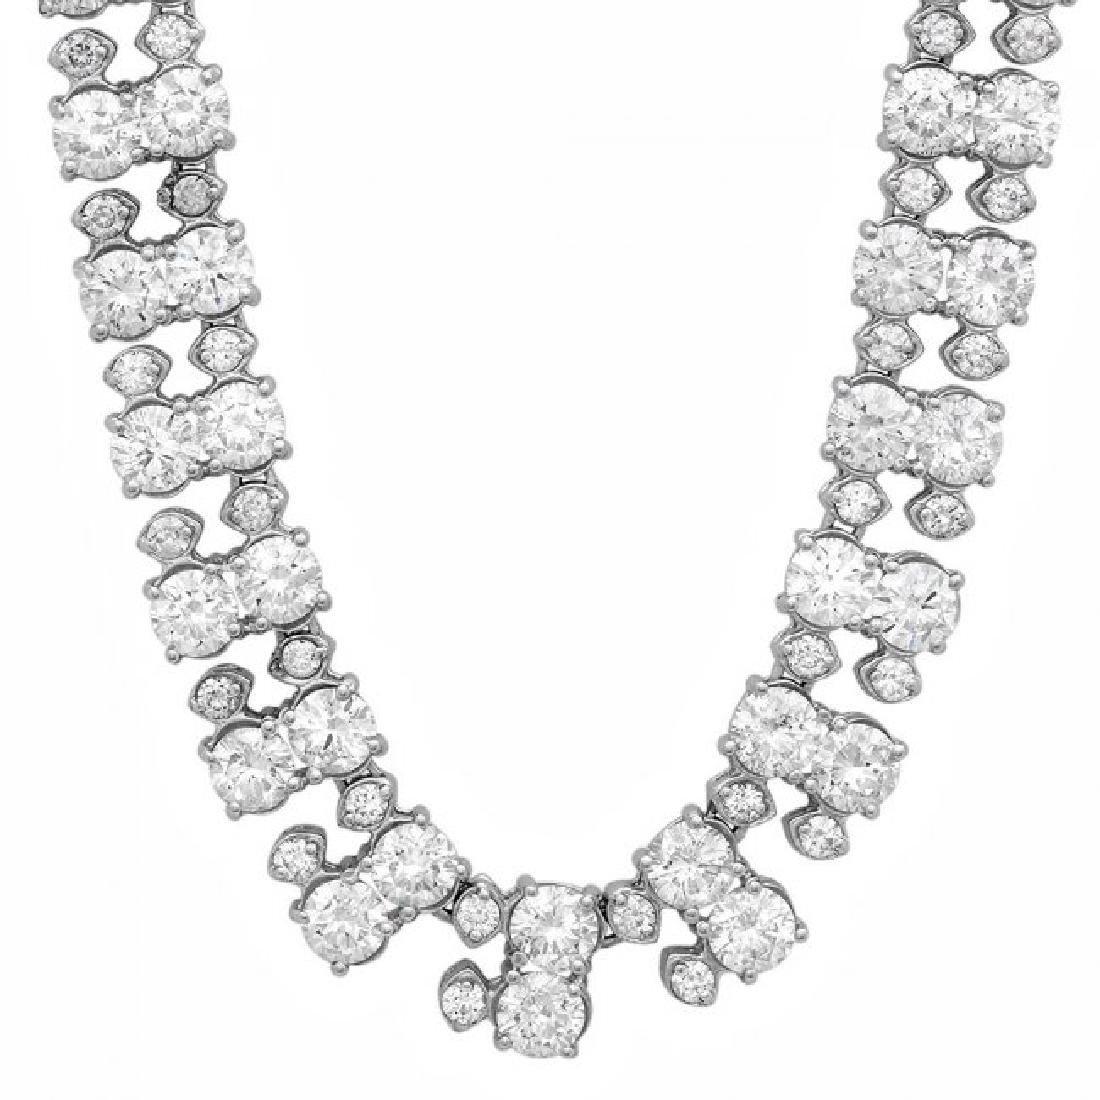 18k White Gold 24ct Diamond Necklace - 2